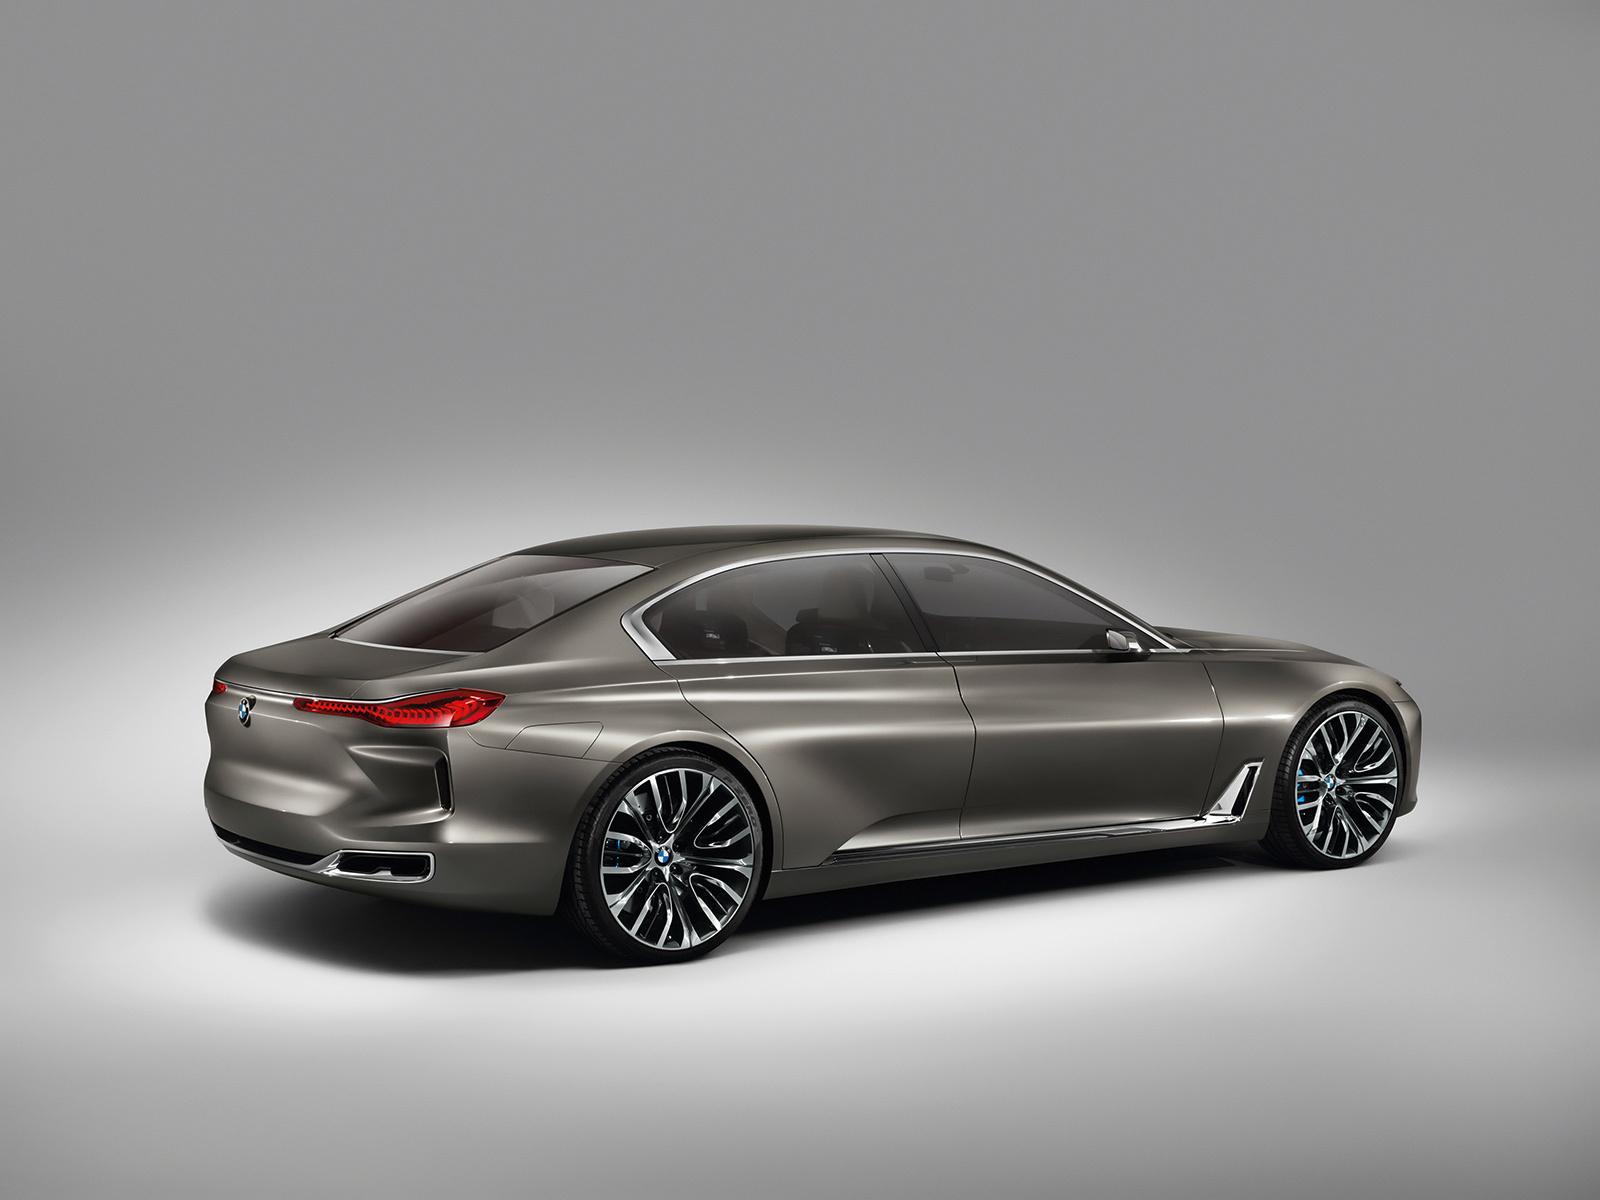 BMW Vision Future Luxury Images